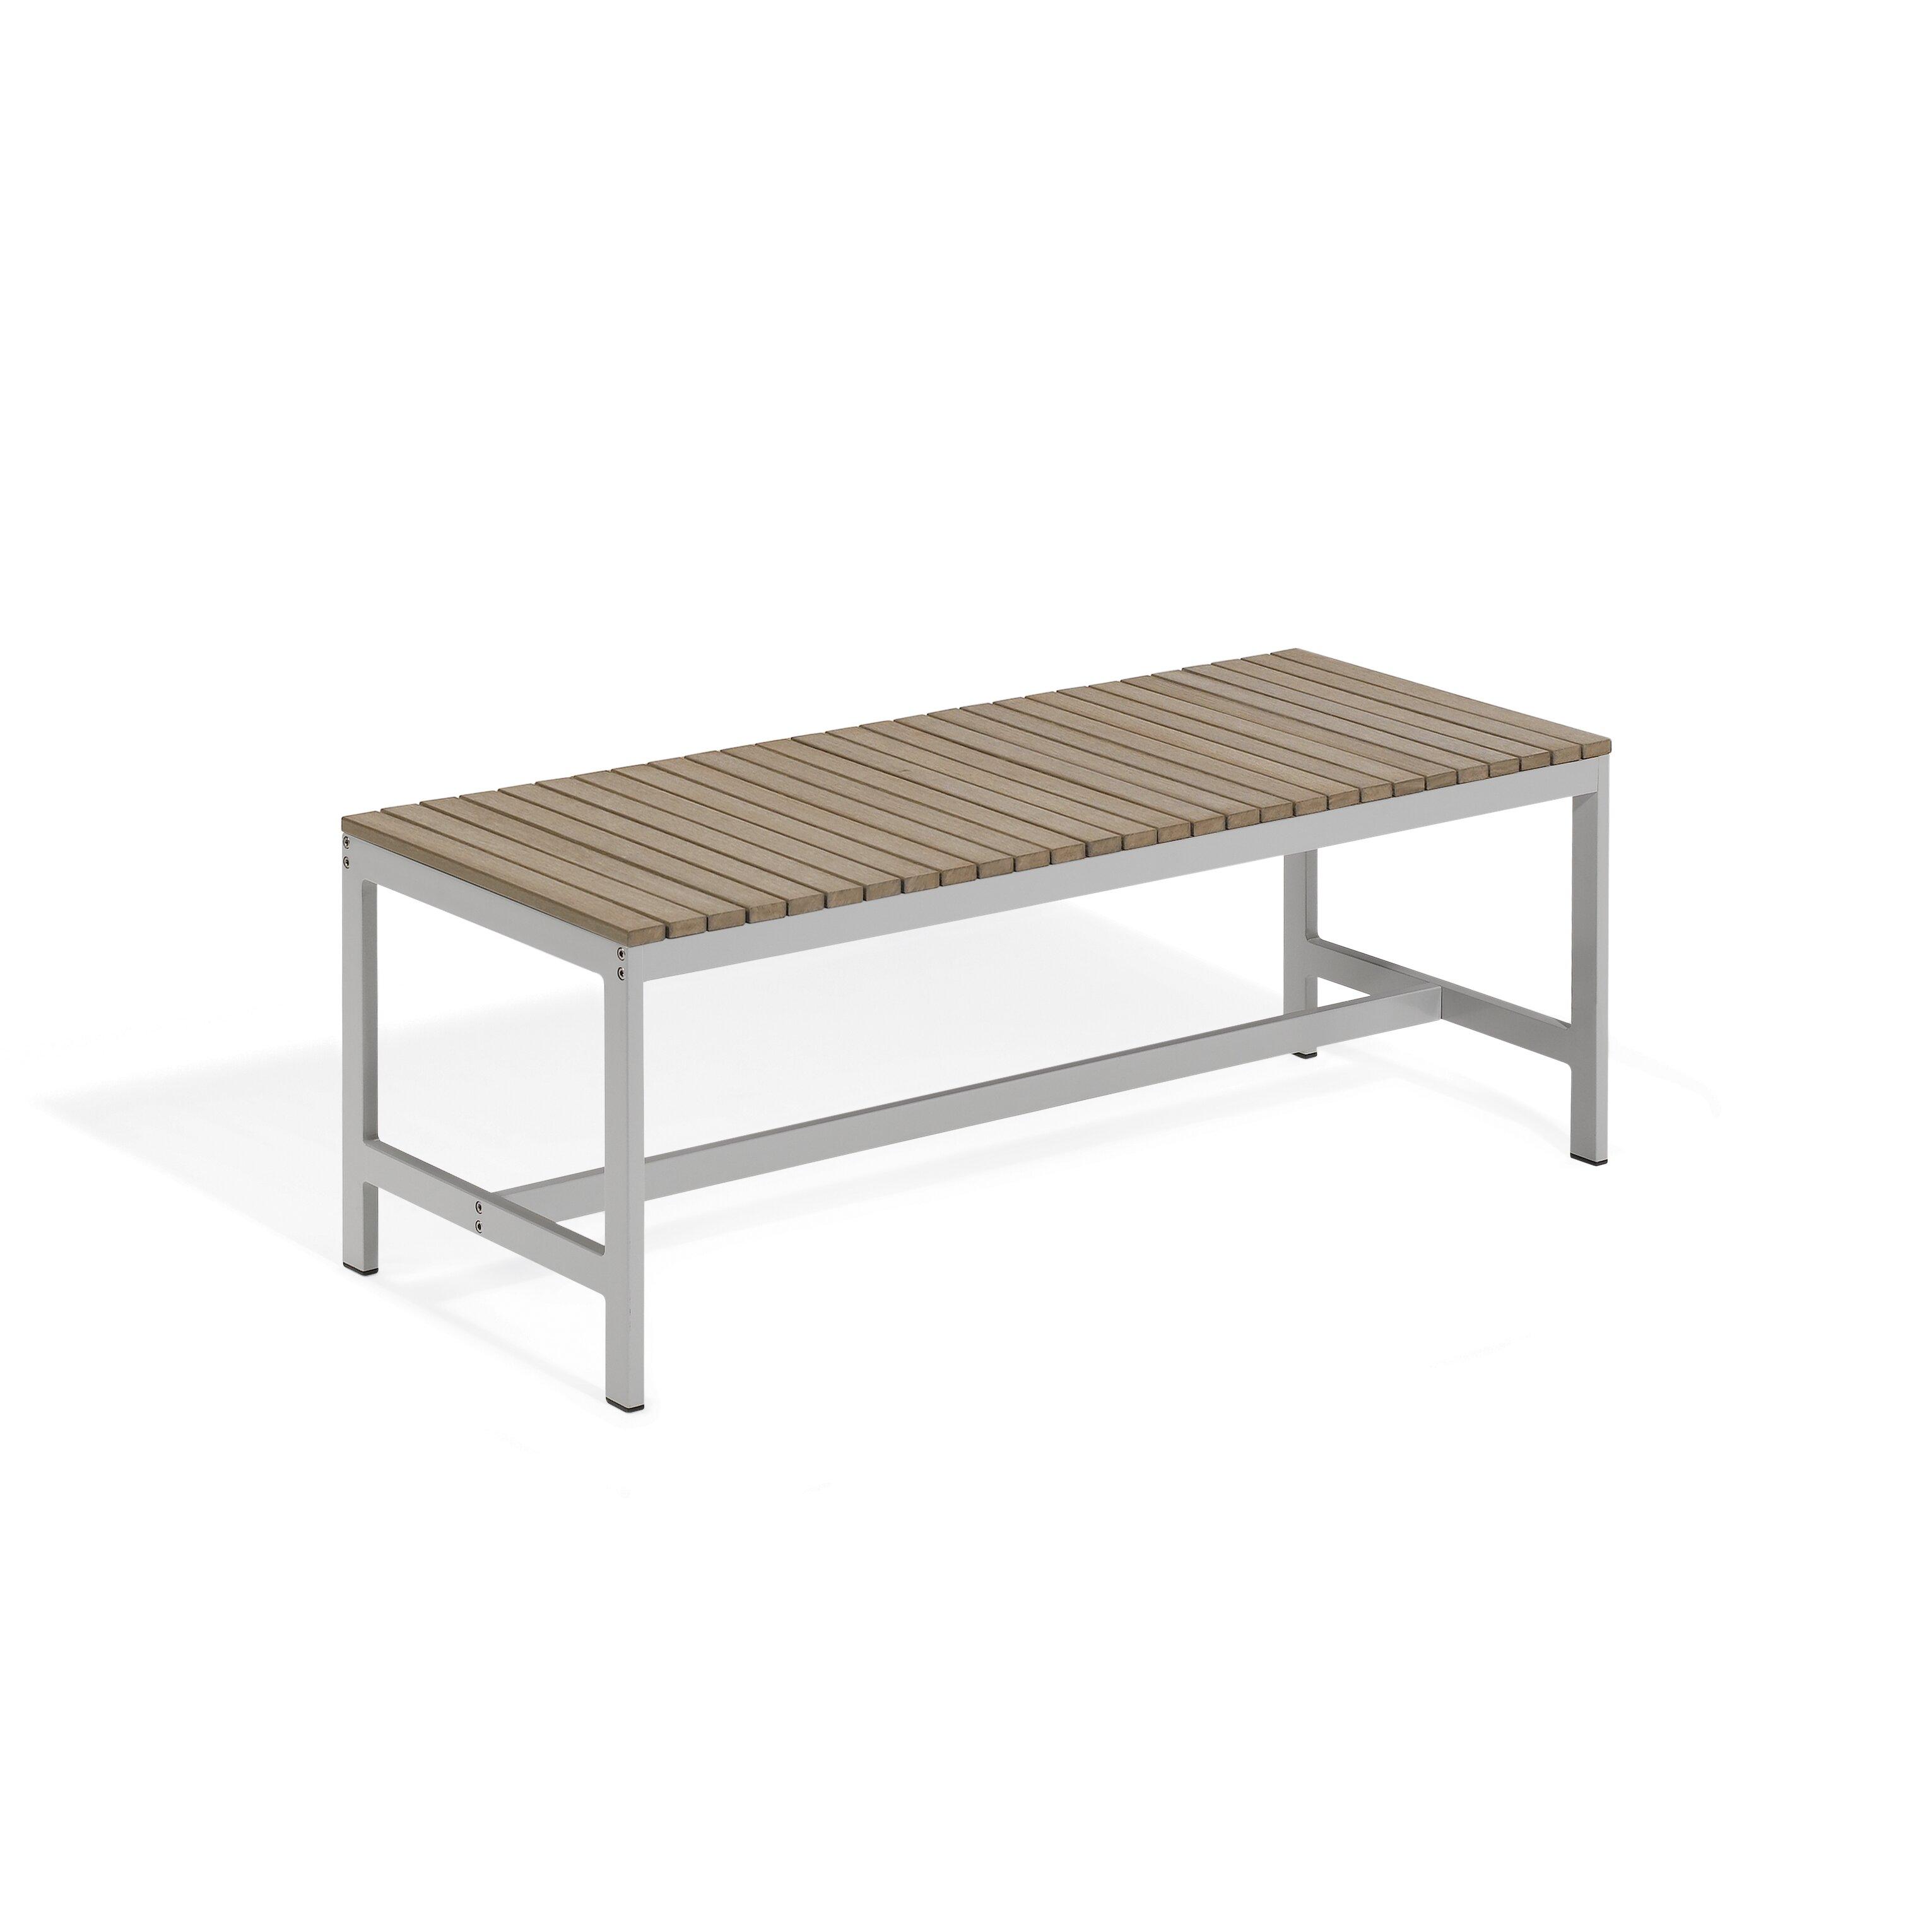 Oxford Garden Travira Wood And Aluminum Picnic Bench Reviews Wayfair